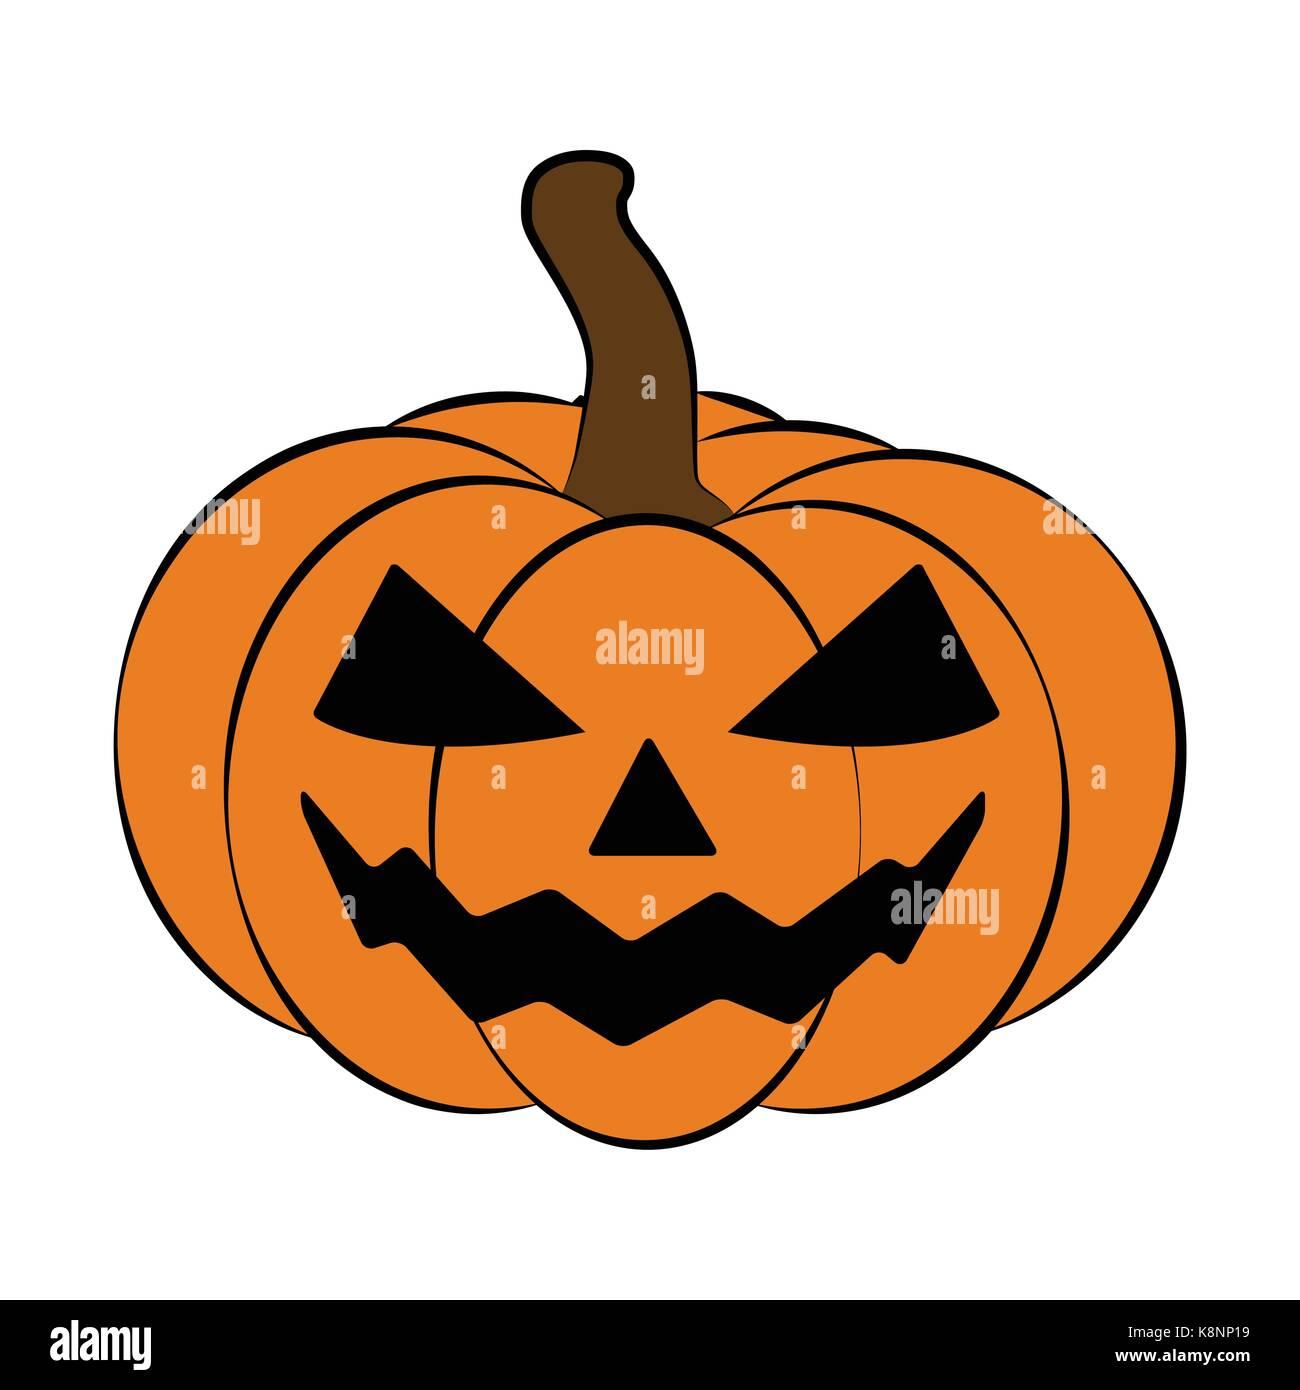 Halloween Pumpkin Vector Art.Halloween Pumpkin Vector Illustration Jack O Lantern